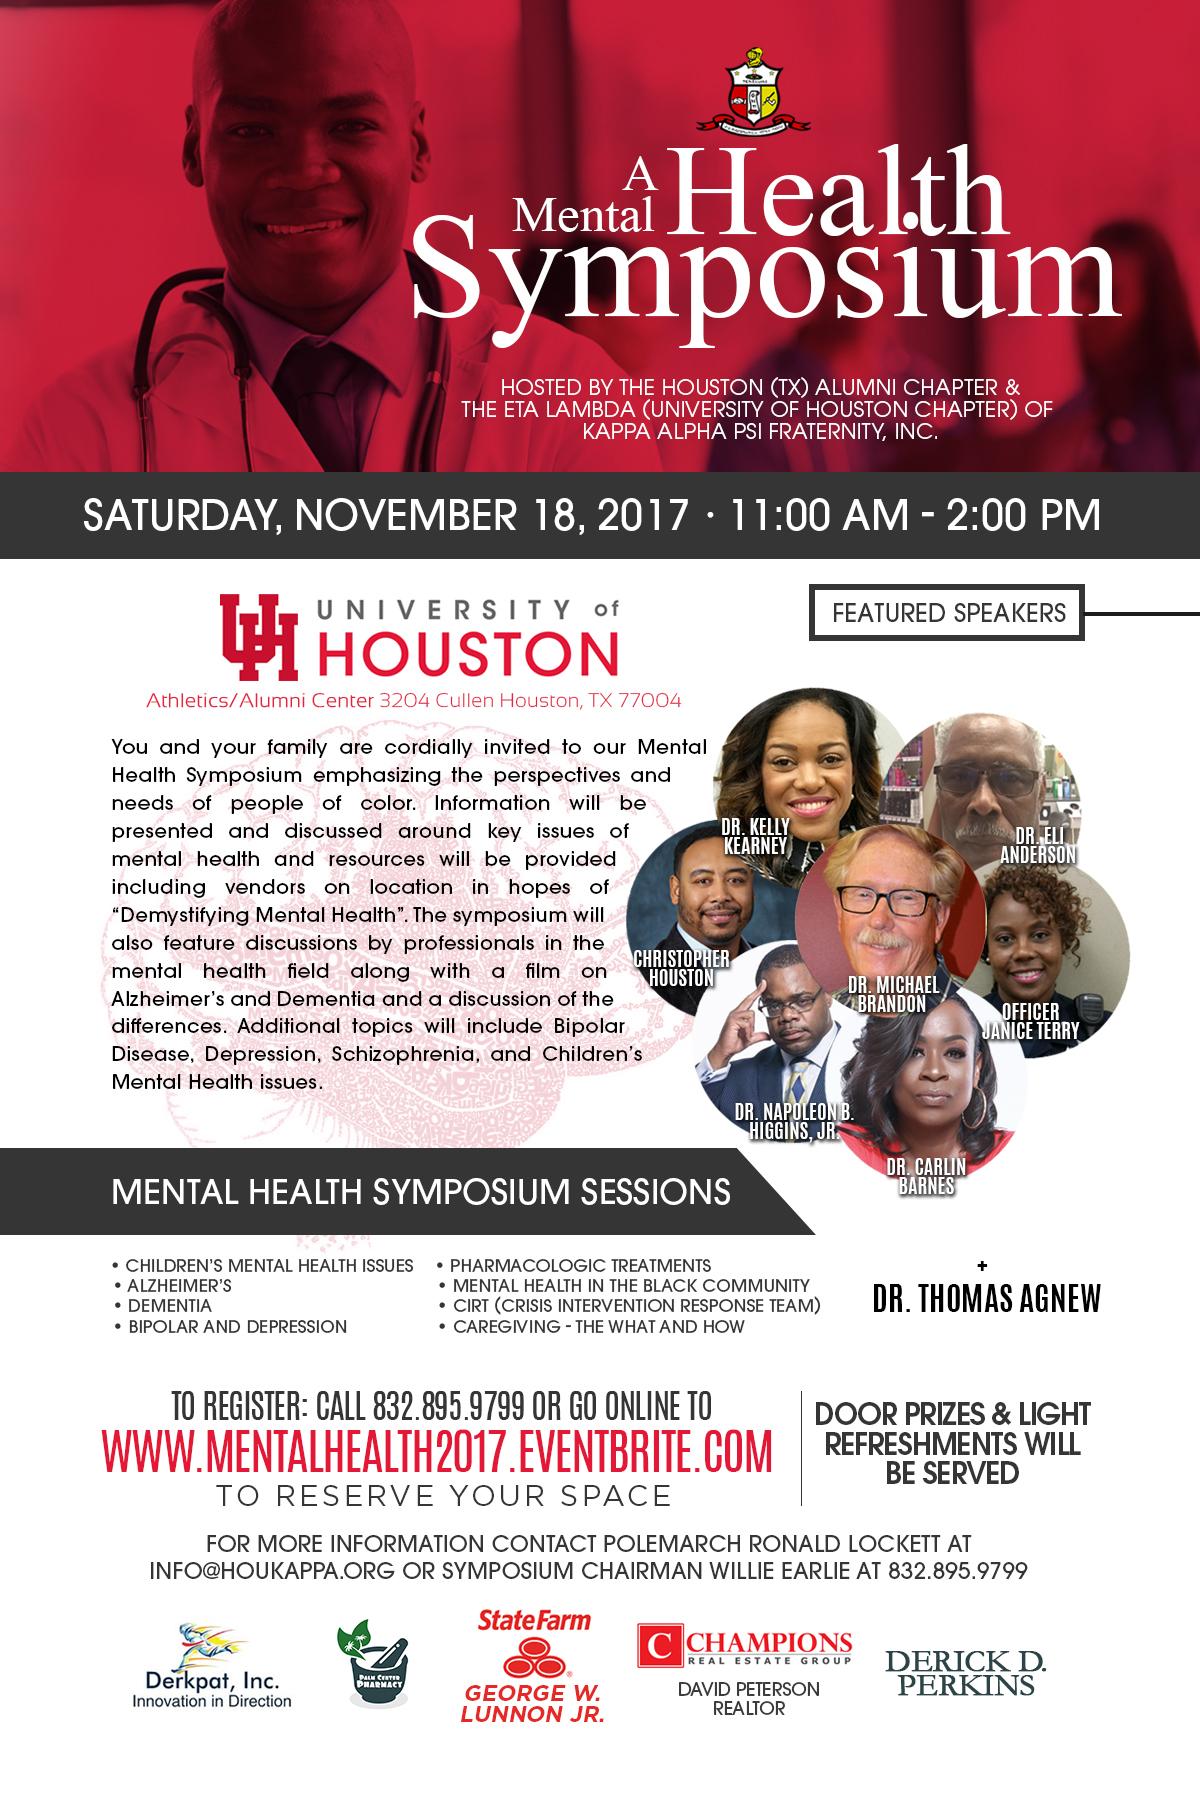 2017 Kappa Alpha Psi Mental Health Symposium